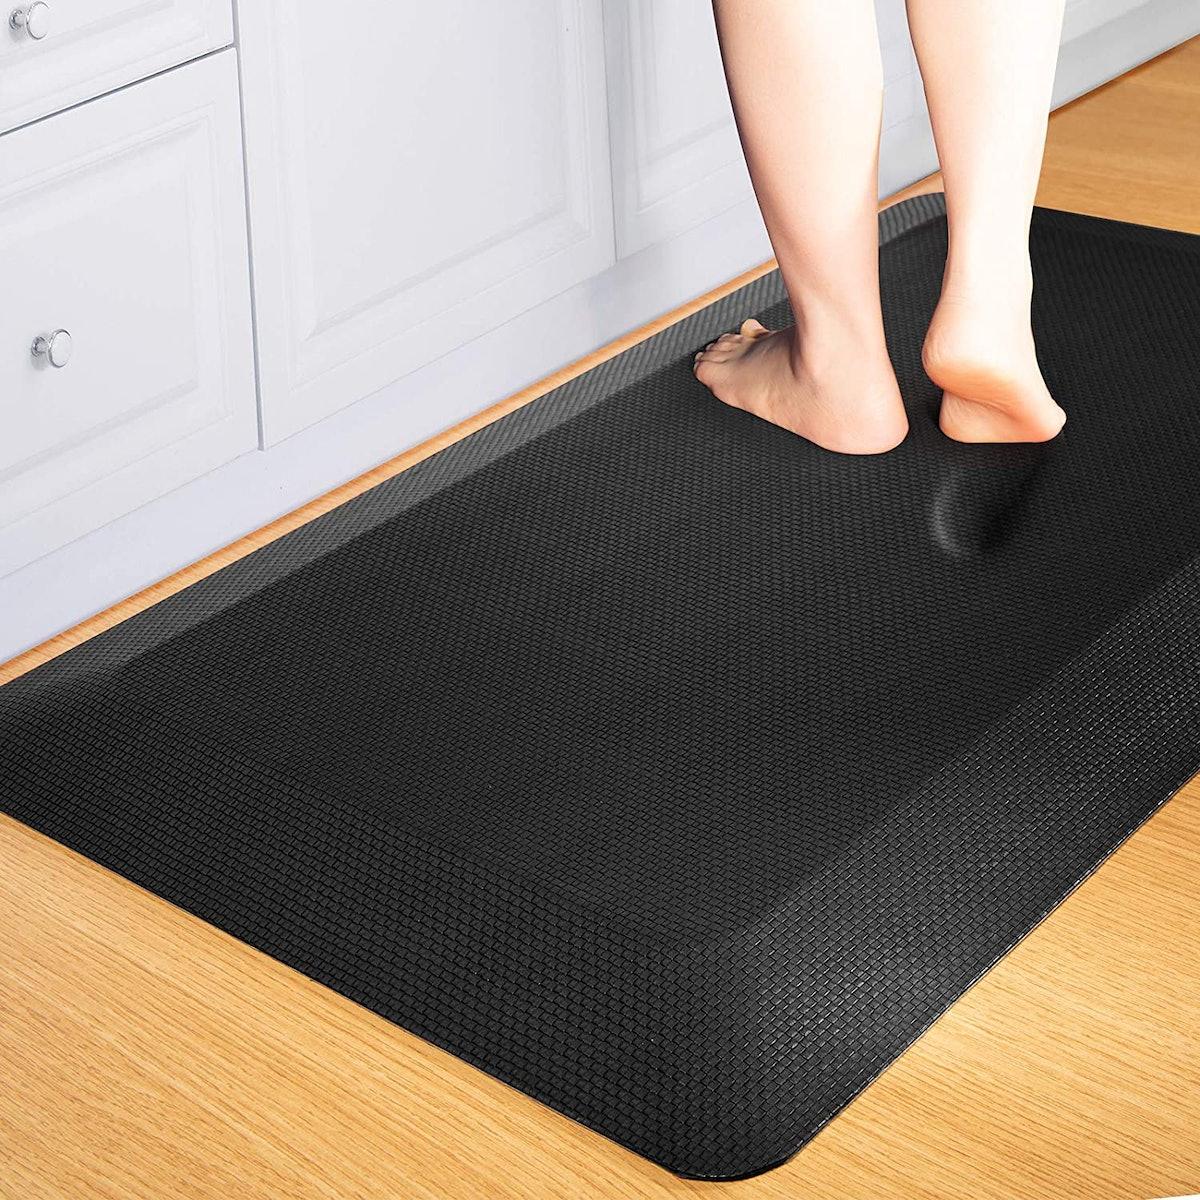 FEATOL Anti Fatigue Kitchen Mat